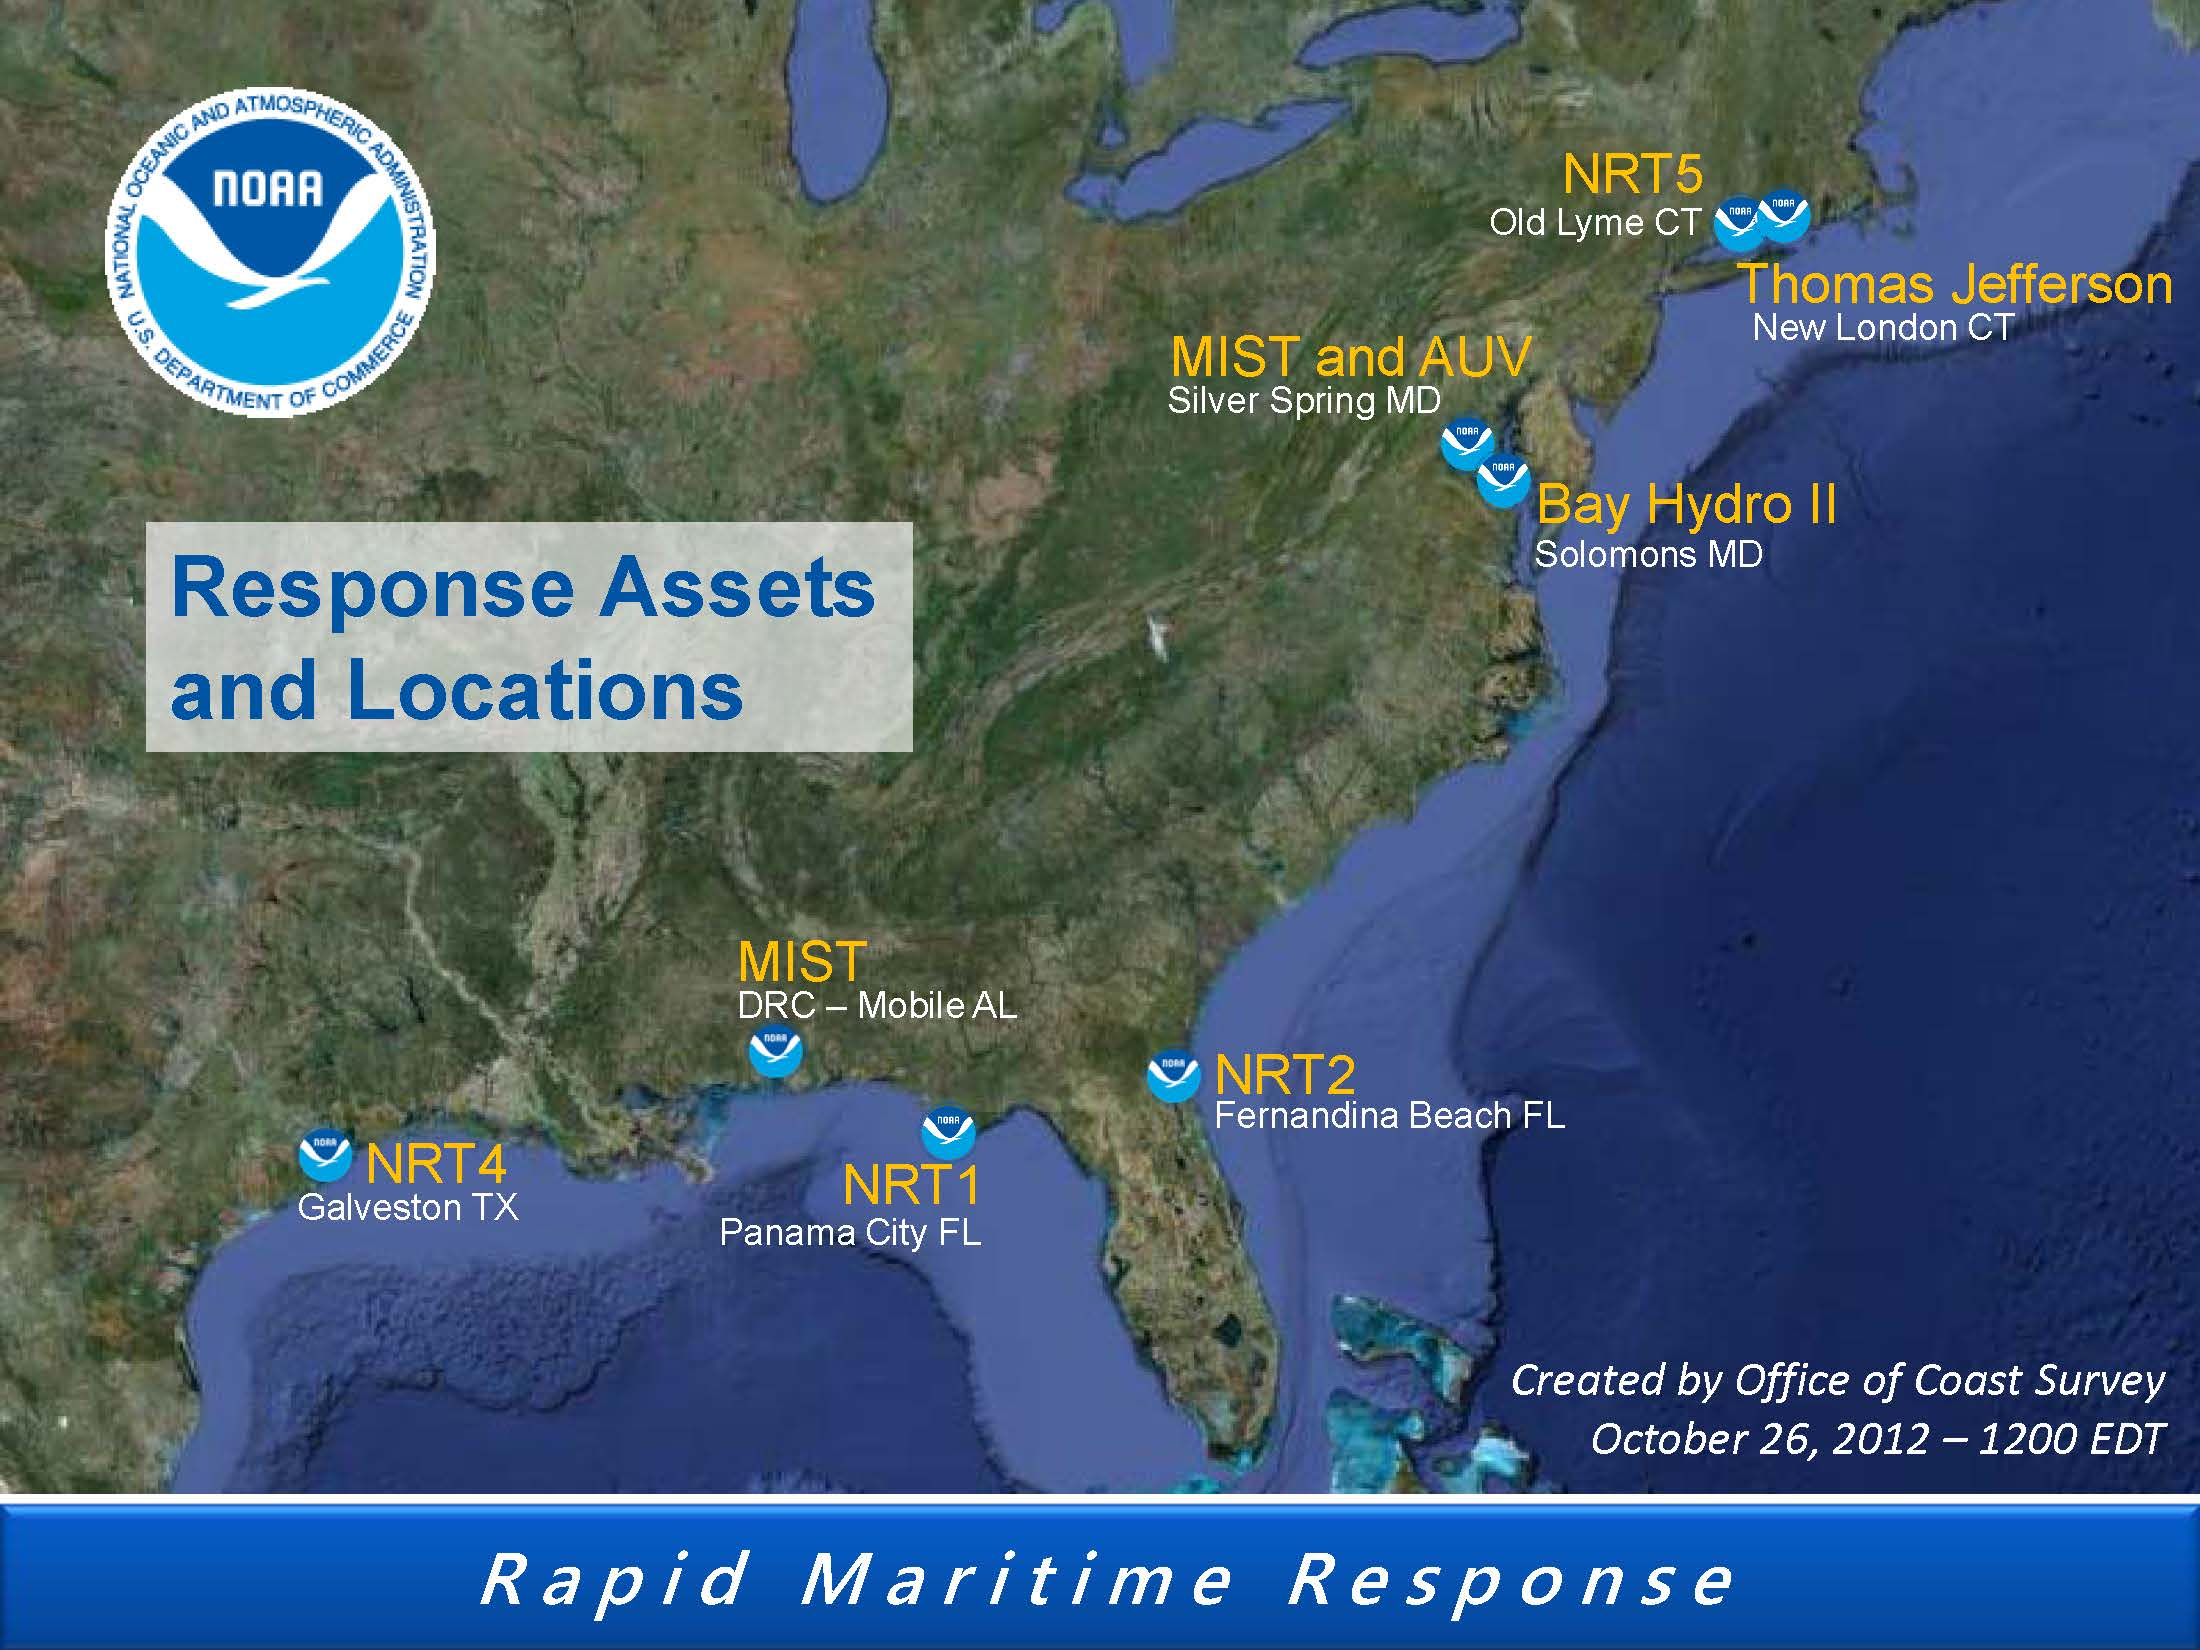 ... Key Hurricane Season Goal of NOAA's Navigation Response Teams bet at home jej konto jest zamknięte bet at home strumieniowe mobilnej